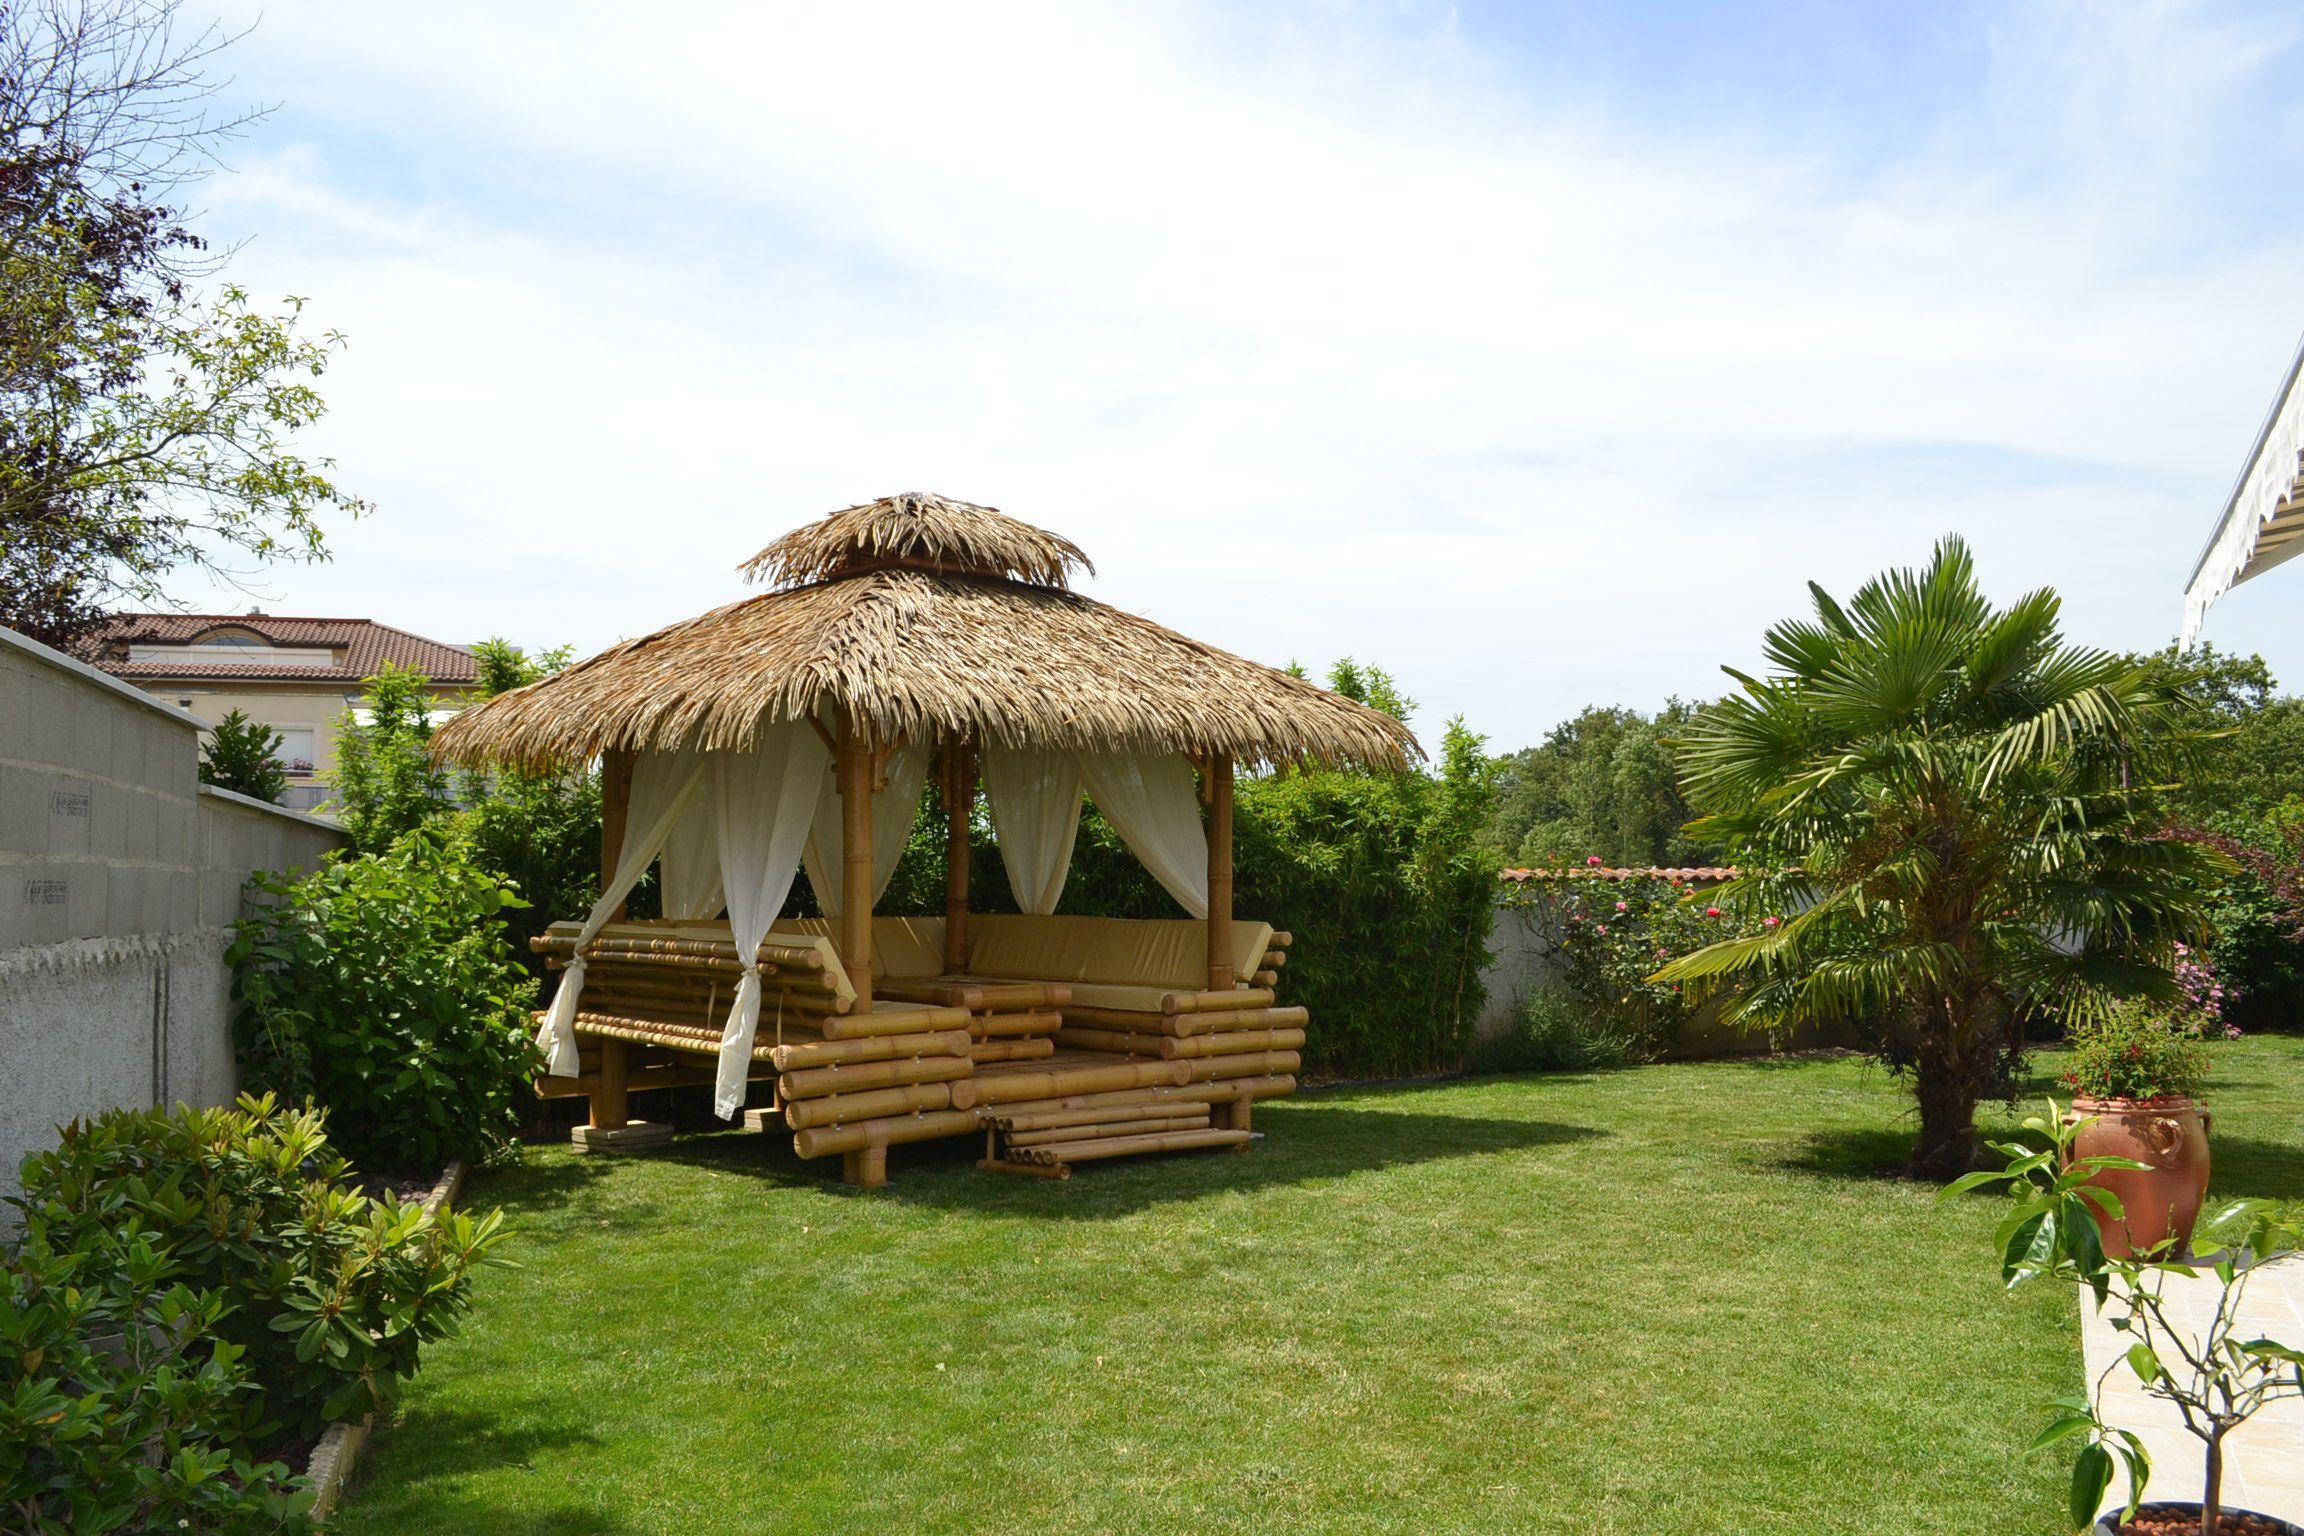 Épinglé Sur Gazebo Bambou, Paillote Bambou Et Bar En Bambou avec Paillote Jardin